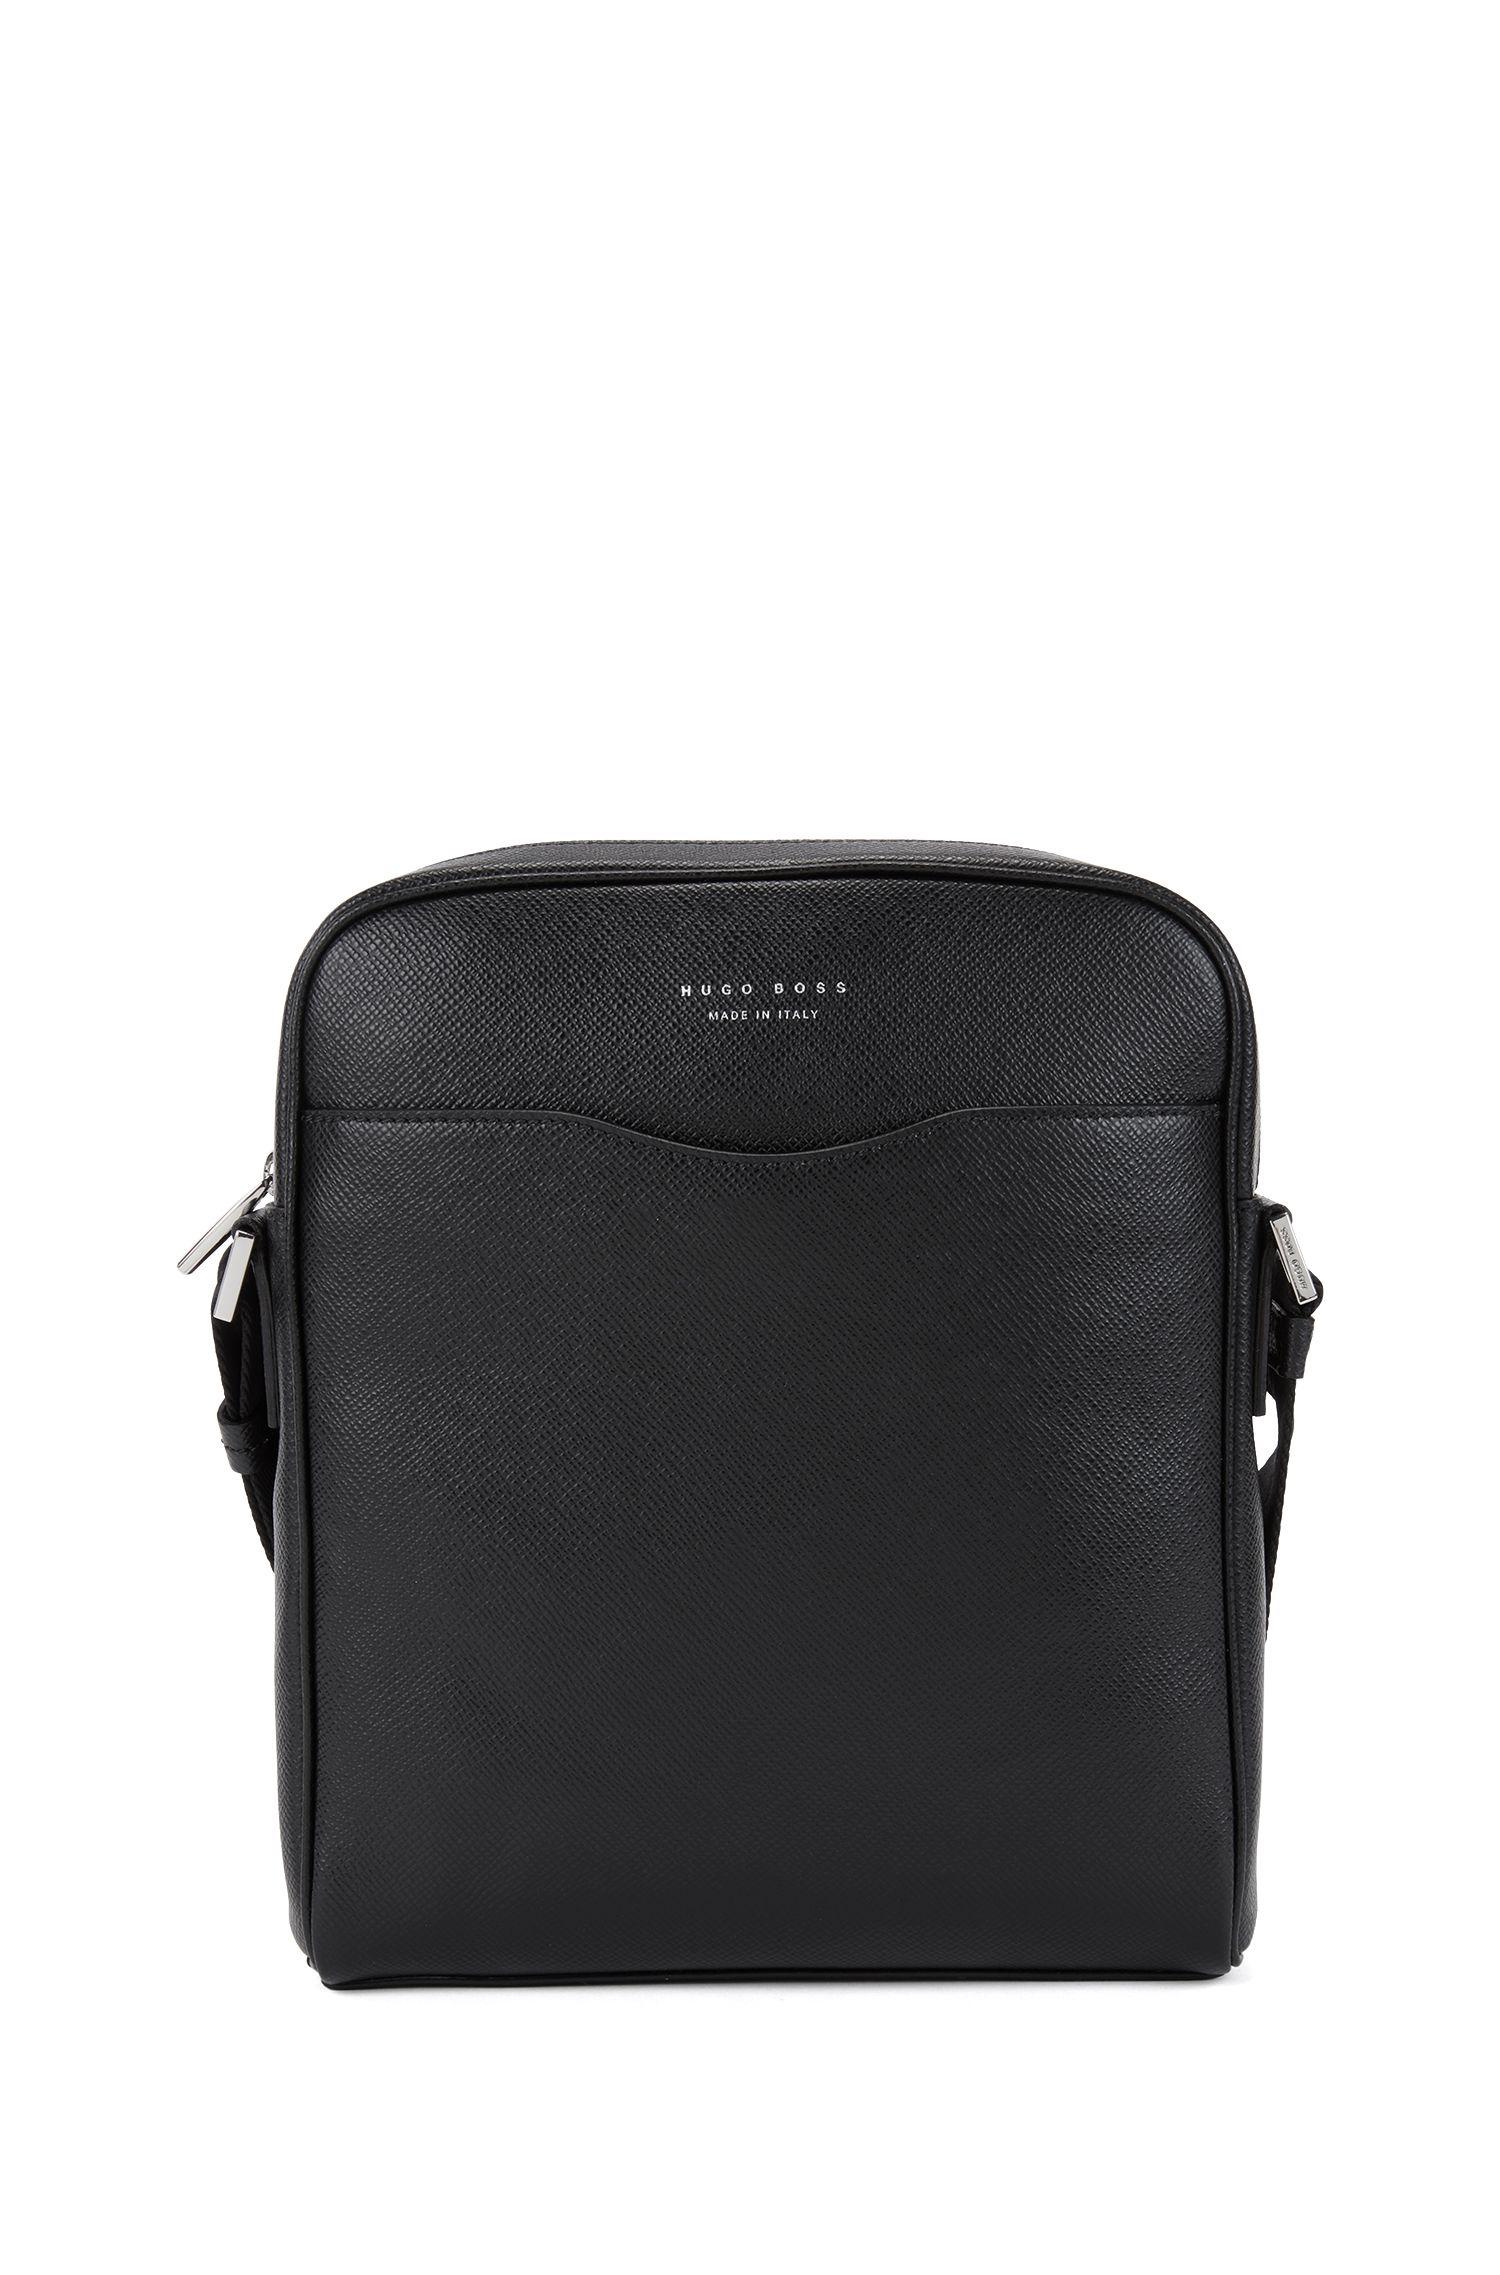 Calfskin Reporter Bag | Signature NS Zip